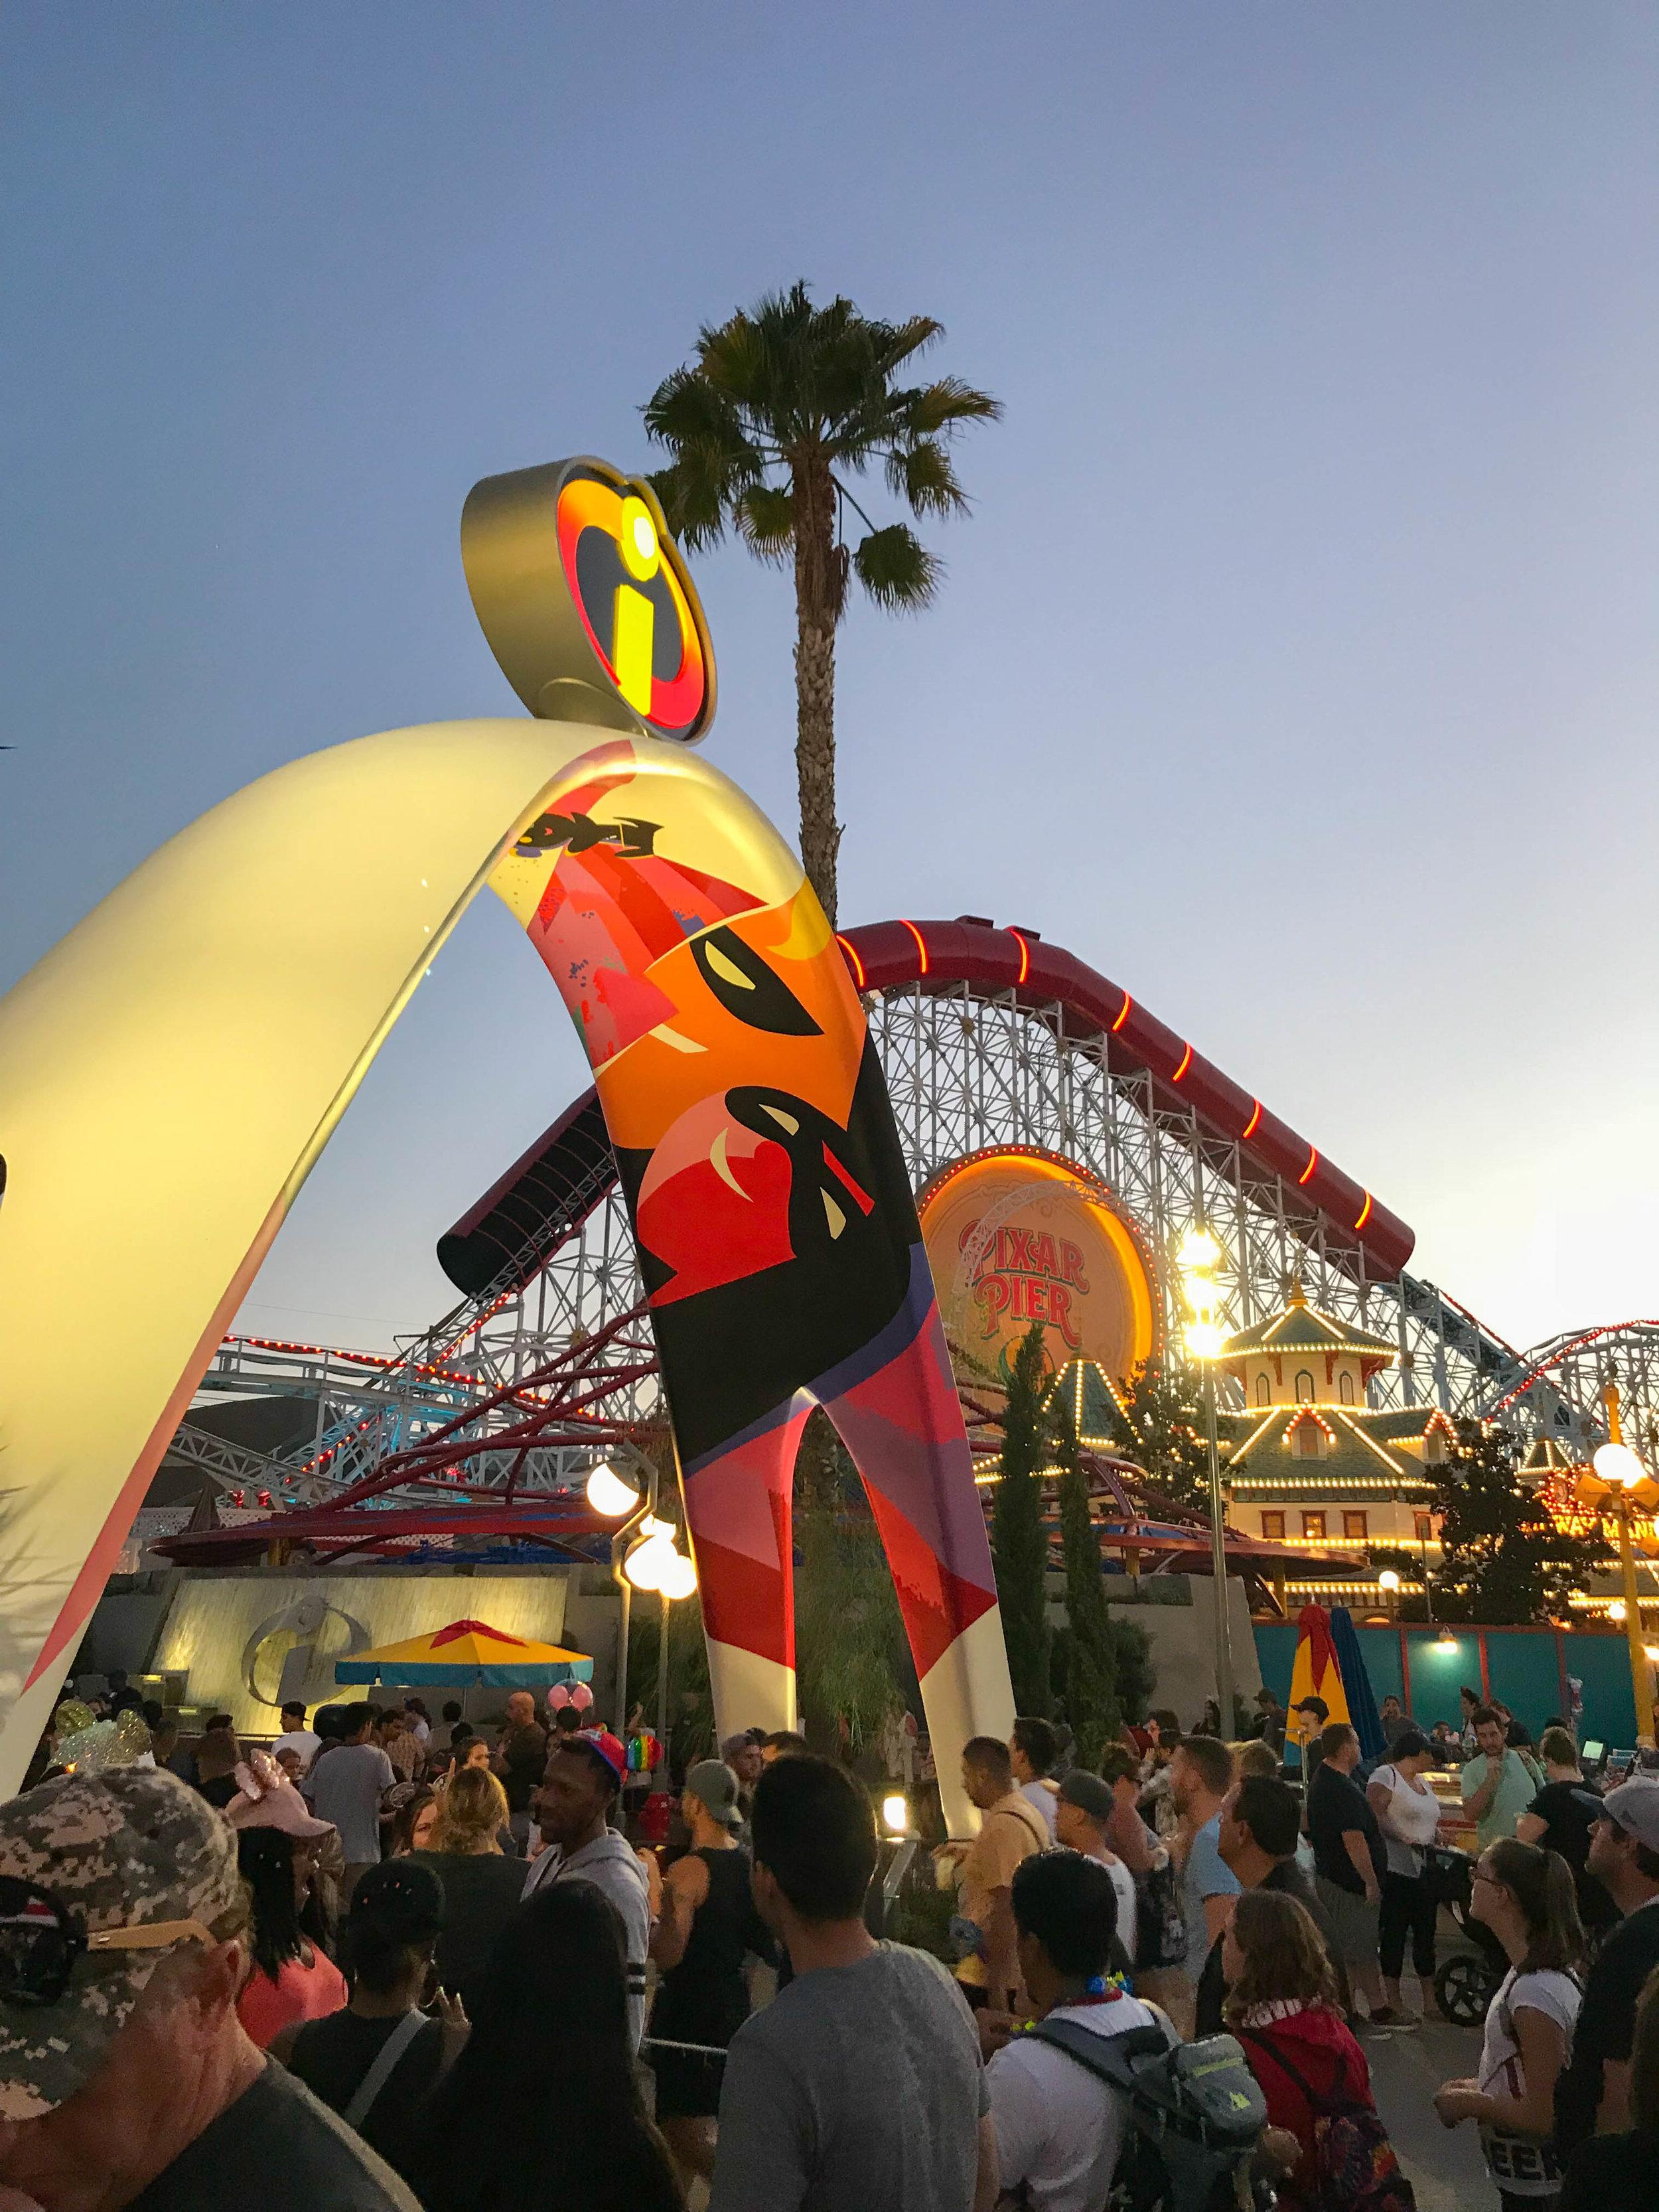 Disneyland_Pixar_Incredicoaster.jpg